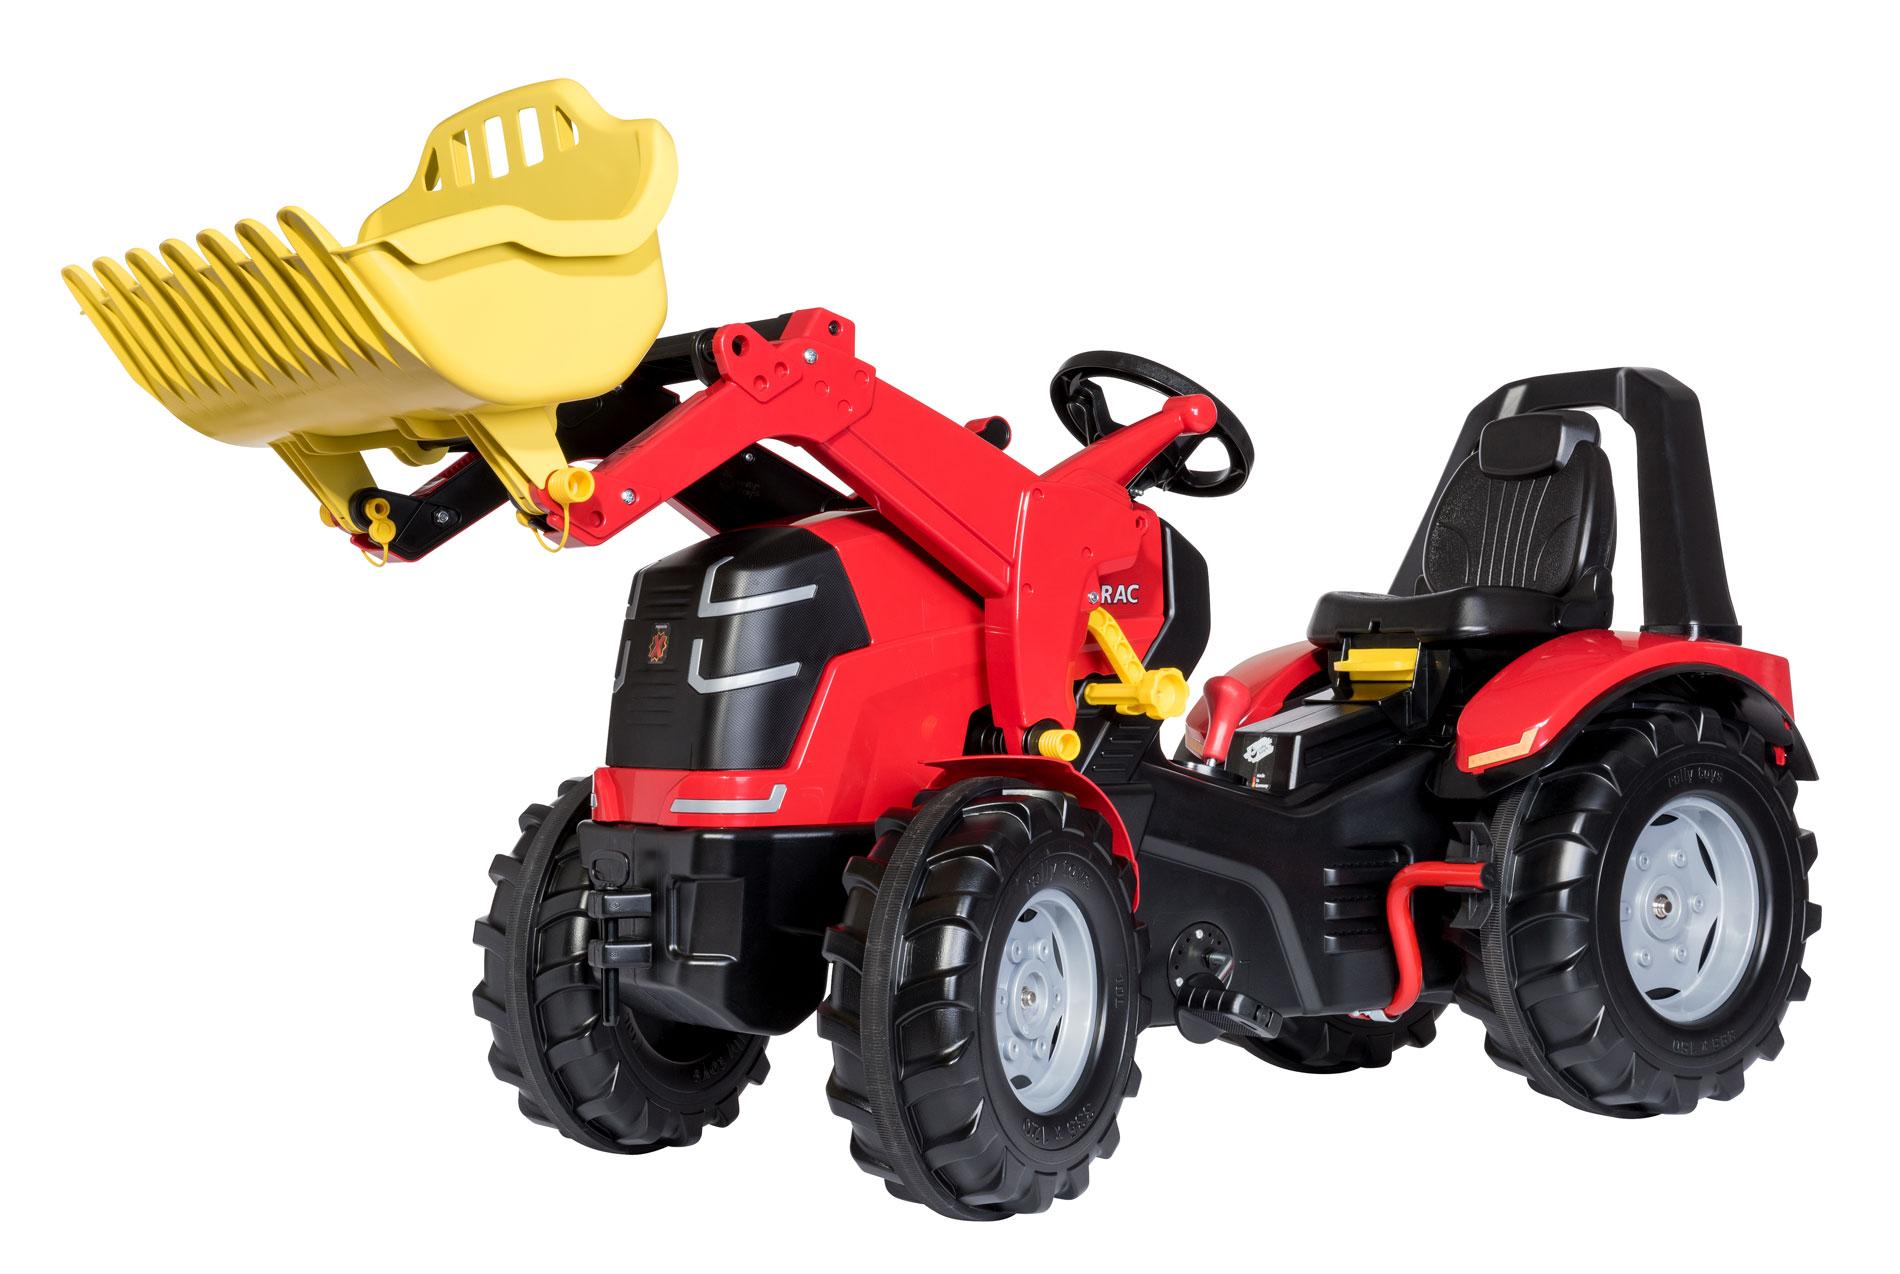 Rolly Toys - šlapací traktor s řazením a ruční brzdou modelová řada X-Trac Premium